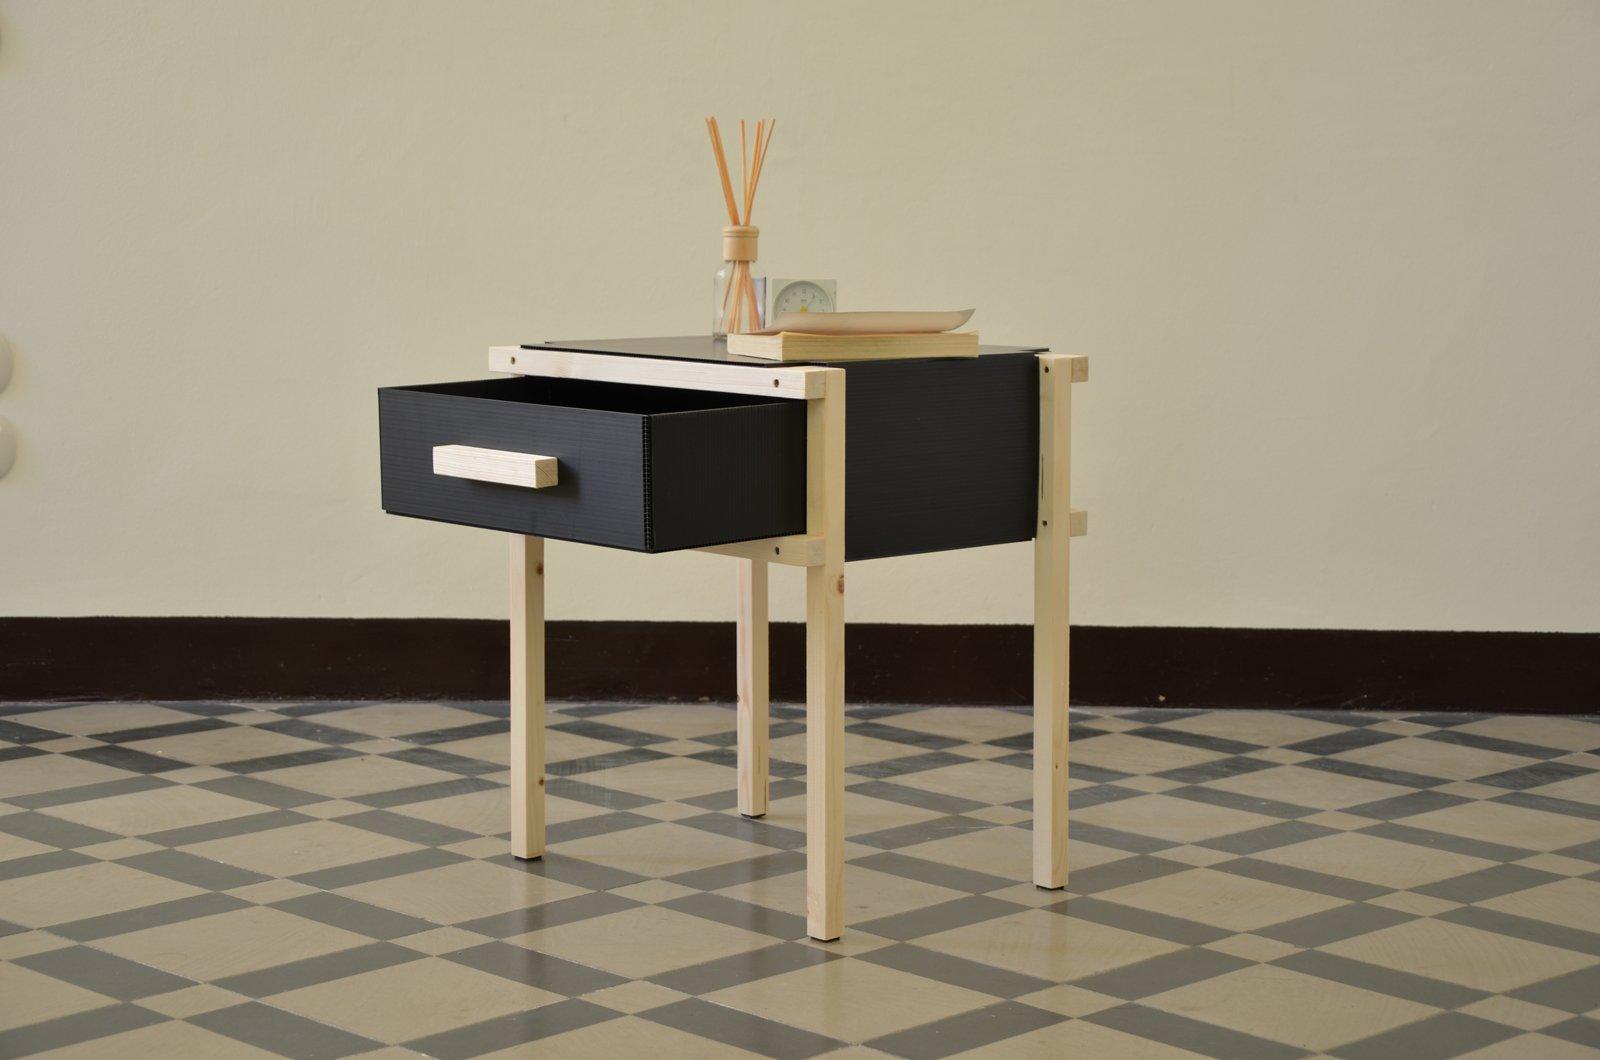 Cornici soffitto leroy merlin idee di design nella - Offerte tavoli da giardino leroy merlin ...